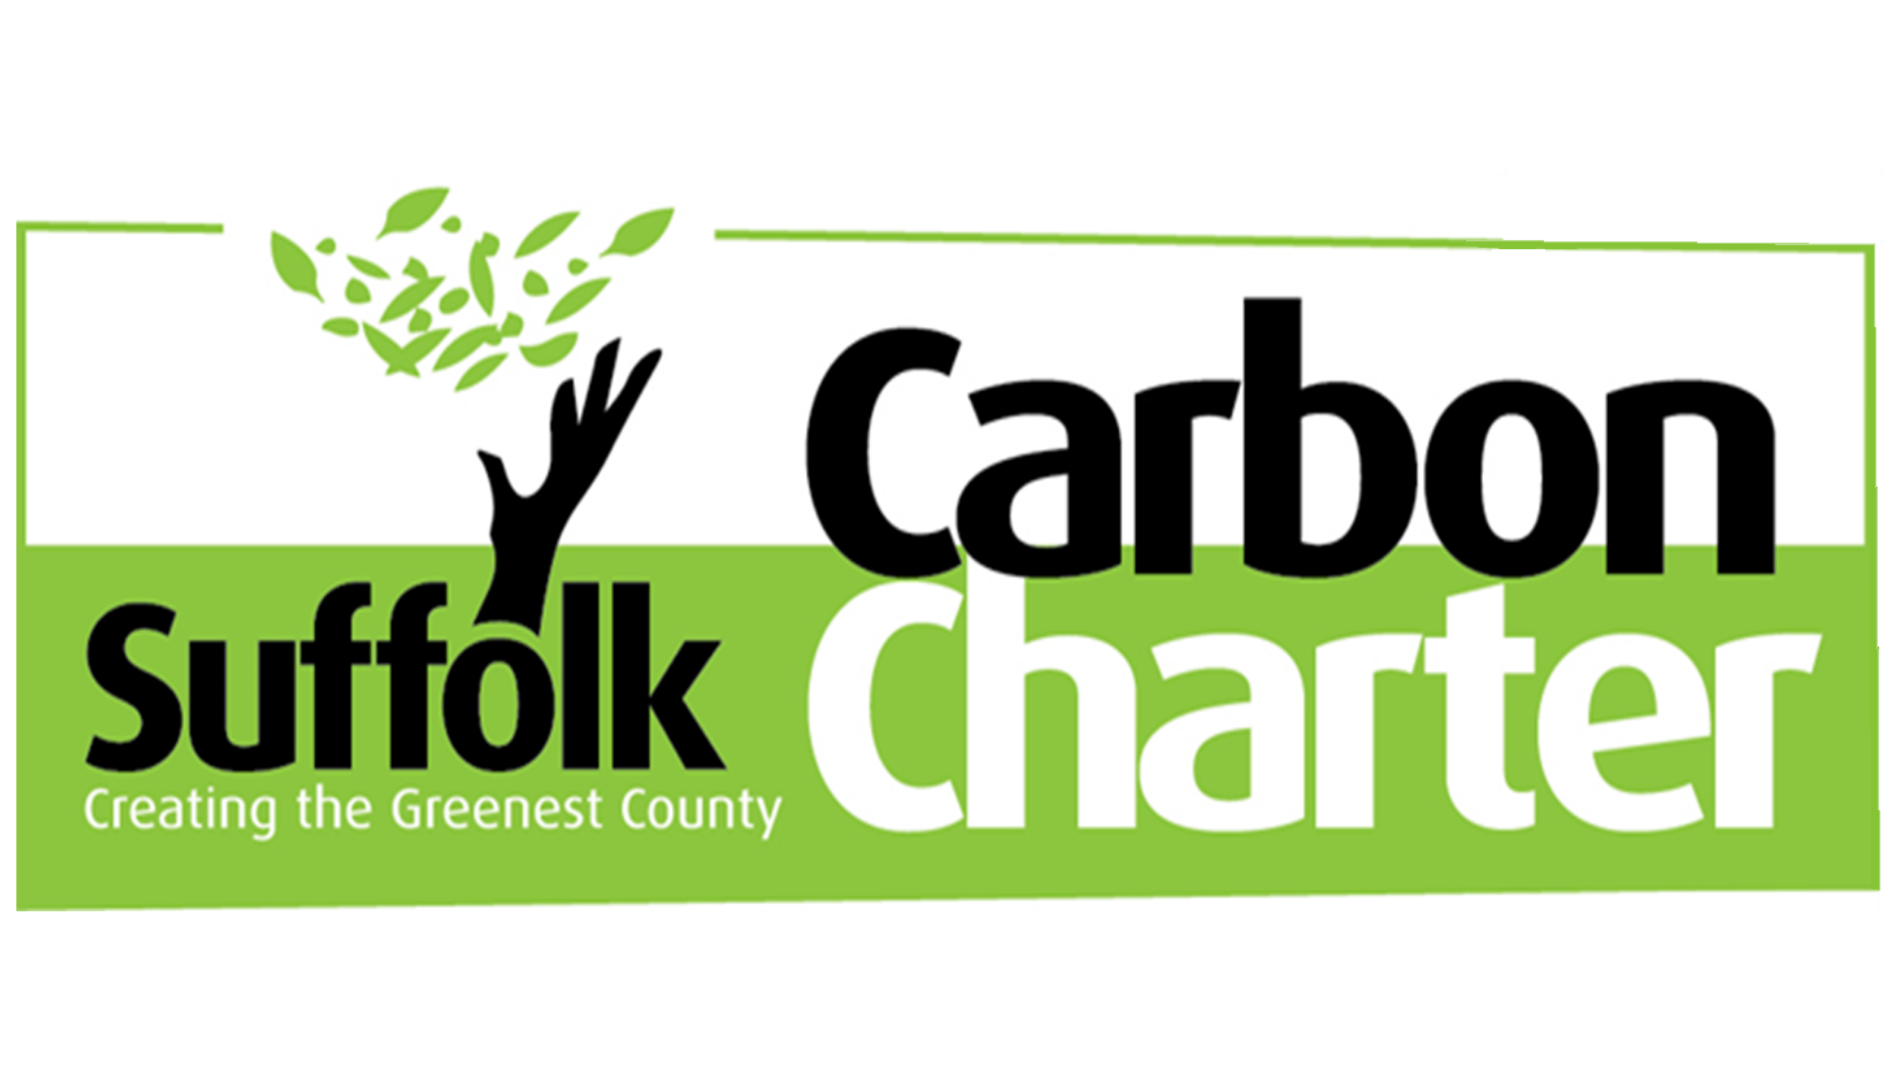 Carbon Charter